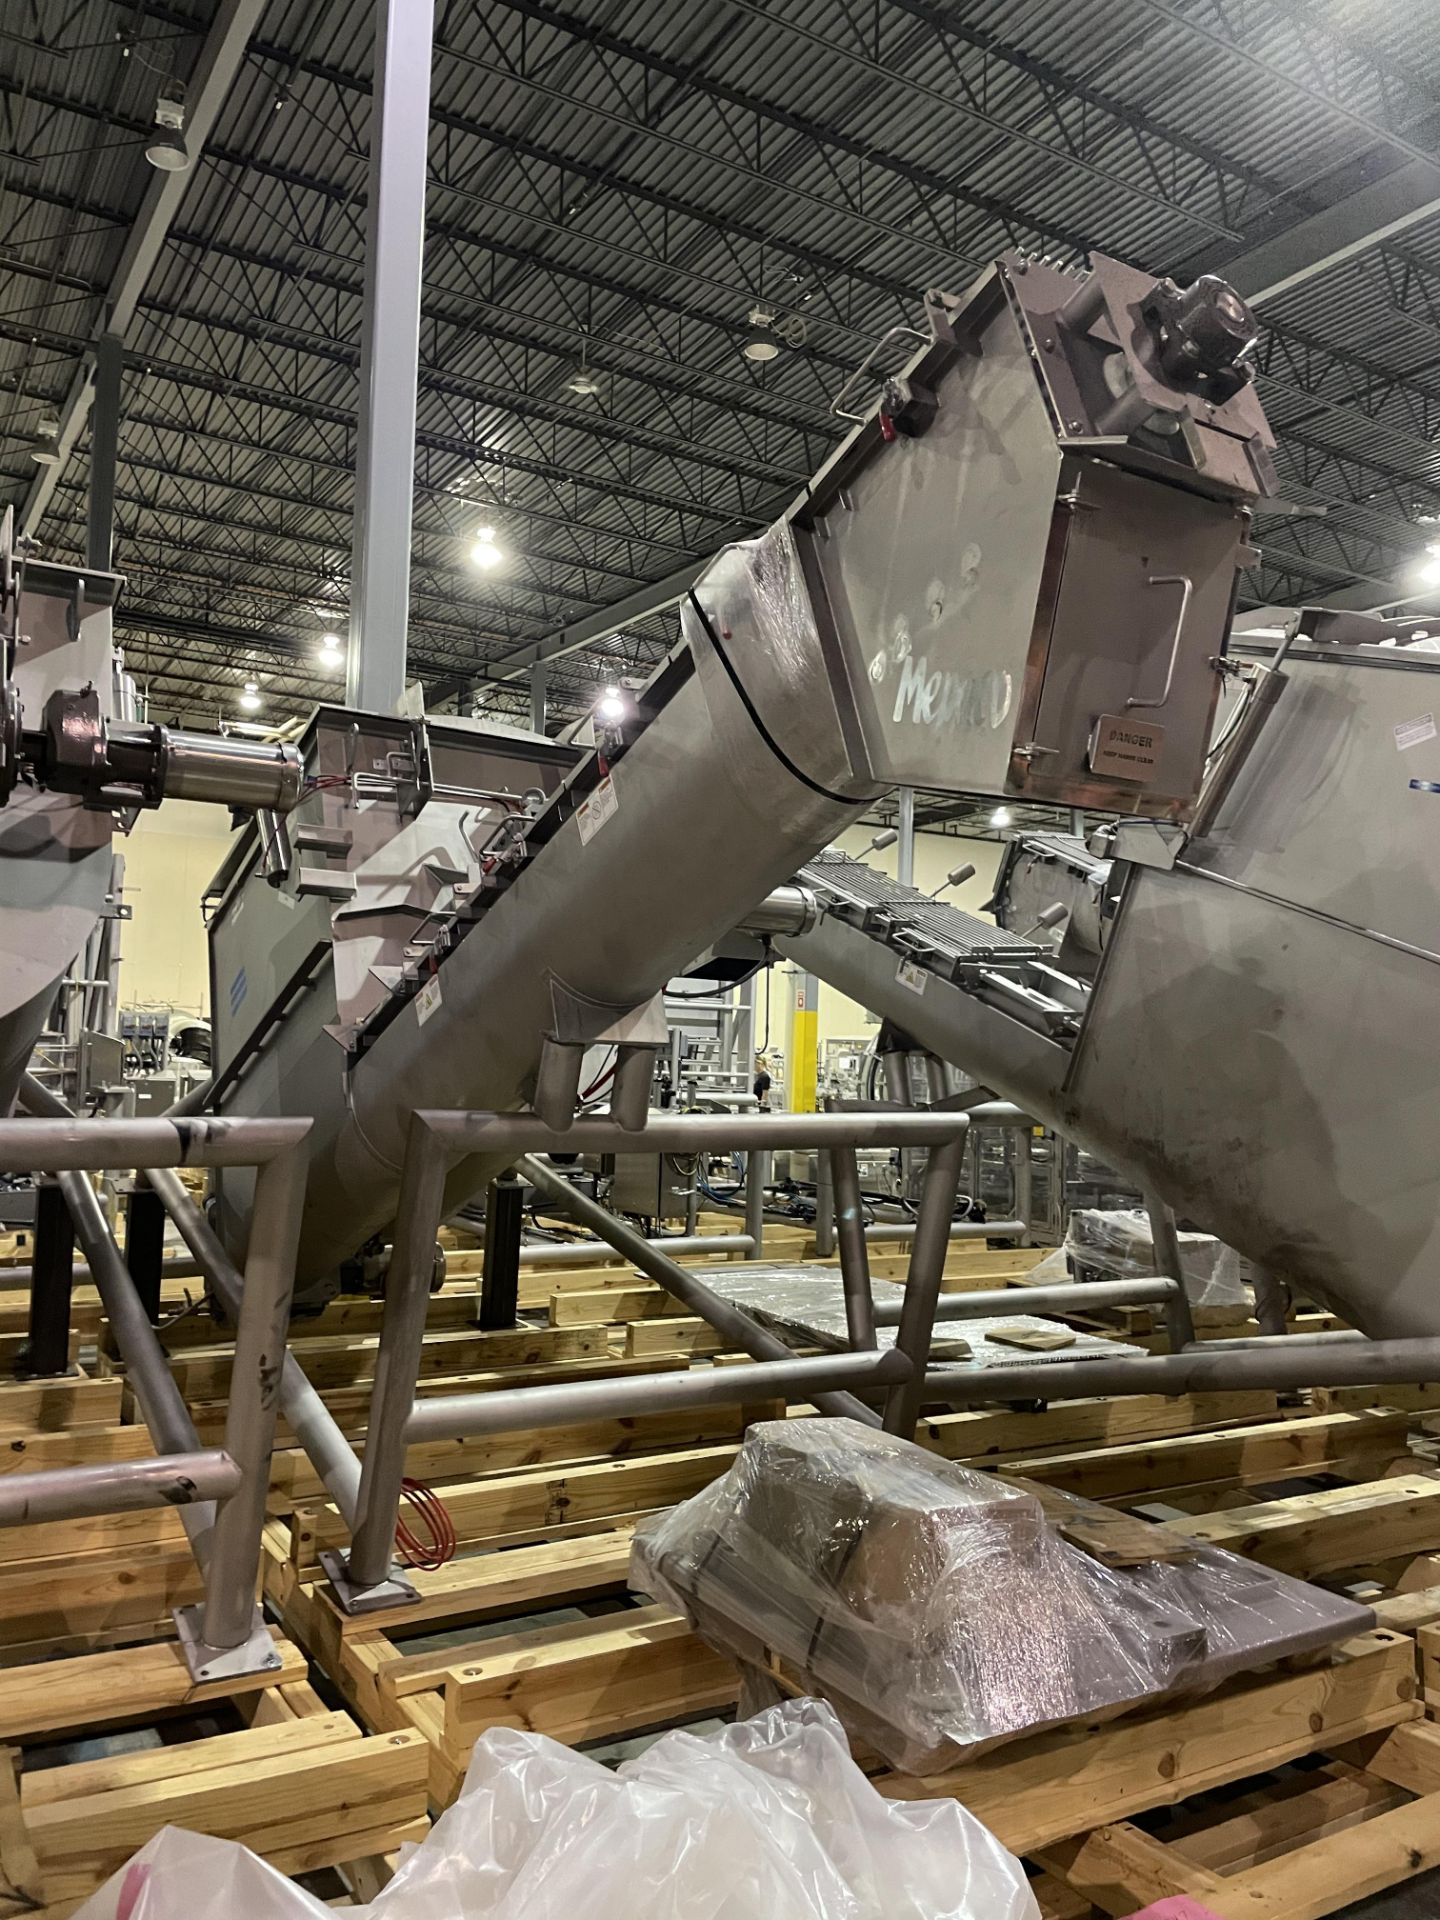 Mepaco Surge Unloader/Dumper Model T4000 S/N M12458-2, 5943-1 Loading/Rigging Fee $750